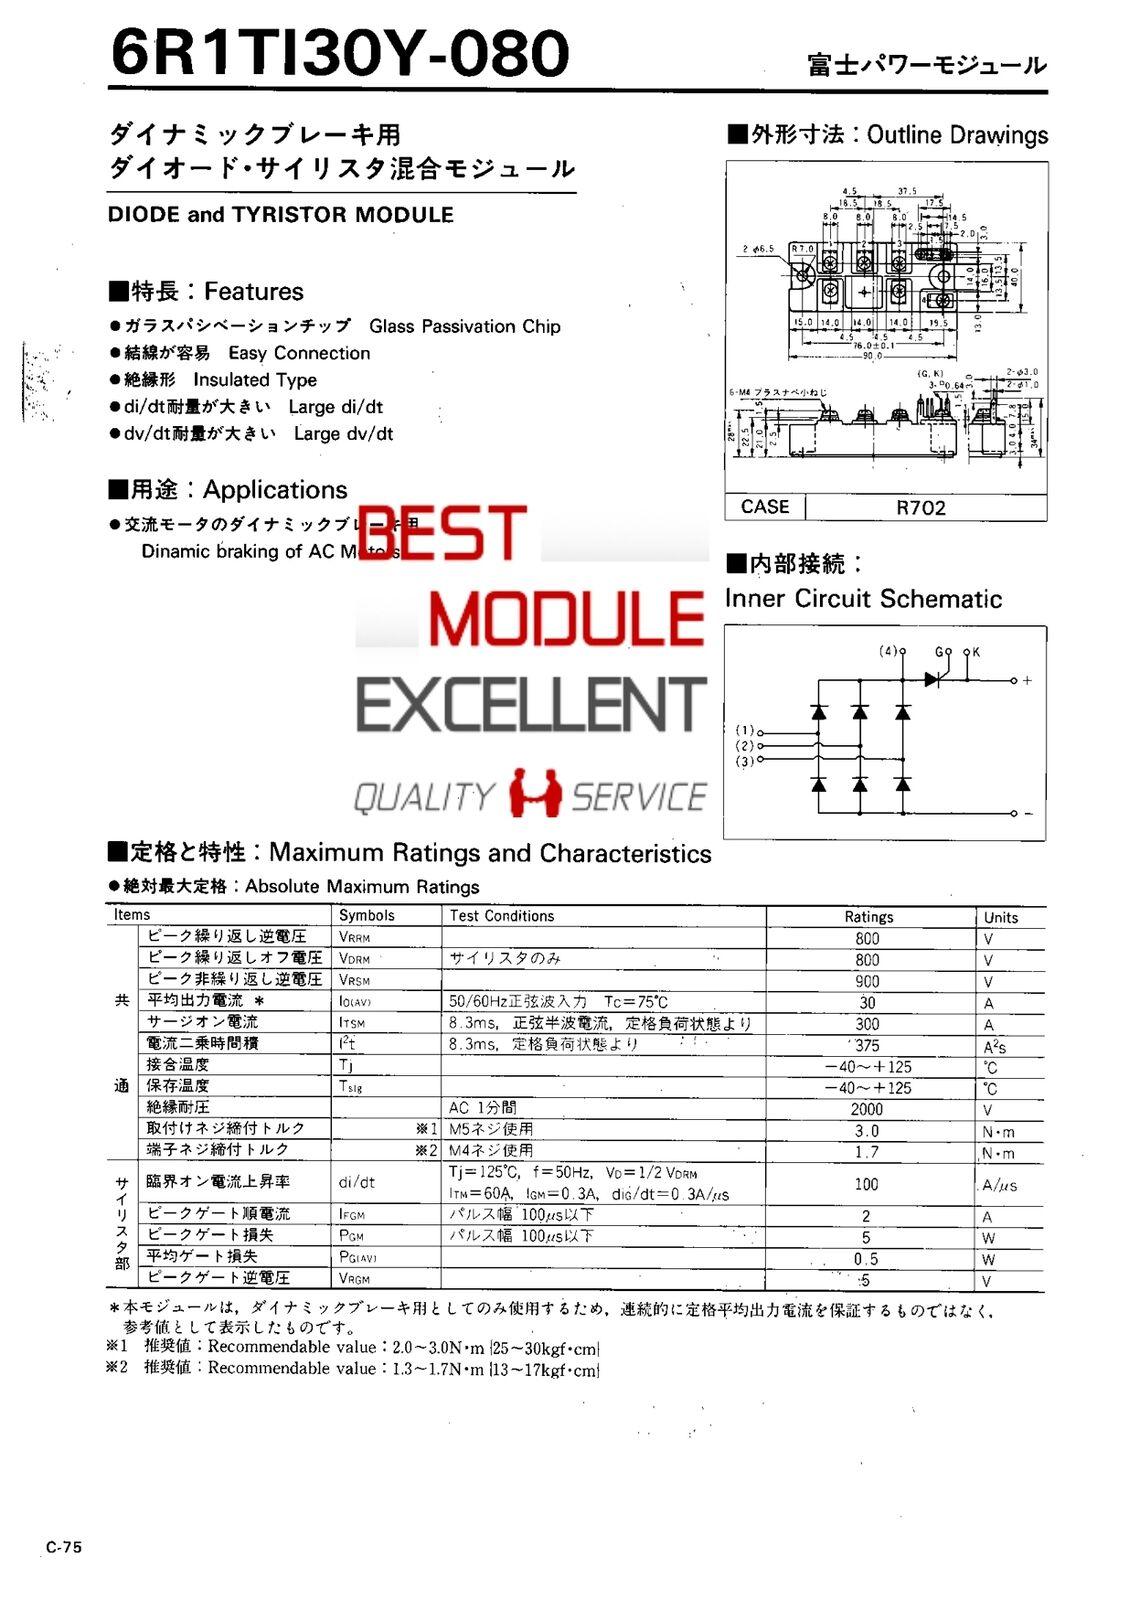 NEW MODULE  4R3TI60Y-080 FUJI LOCATION M